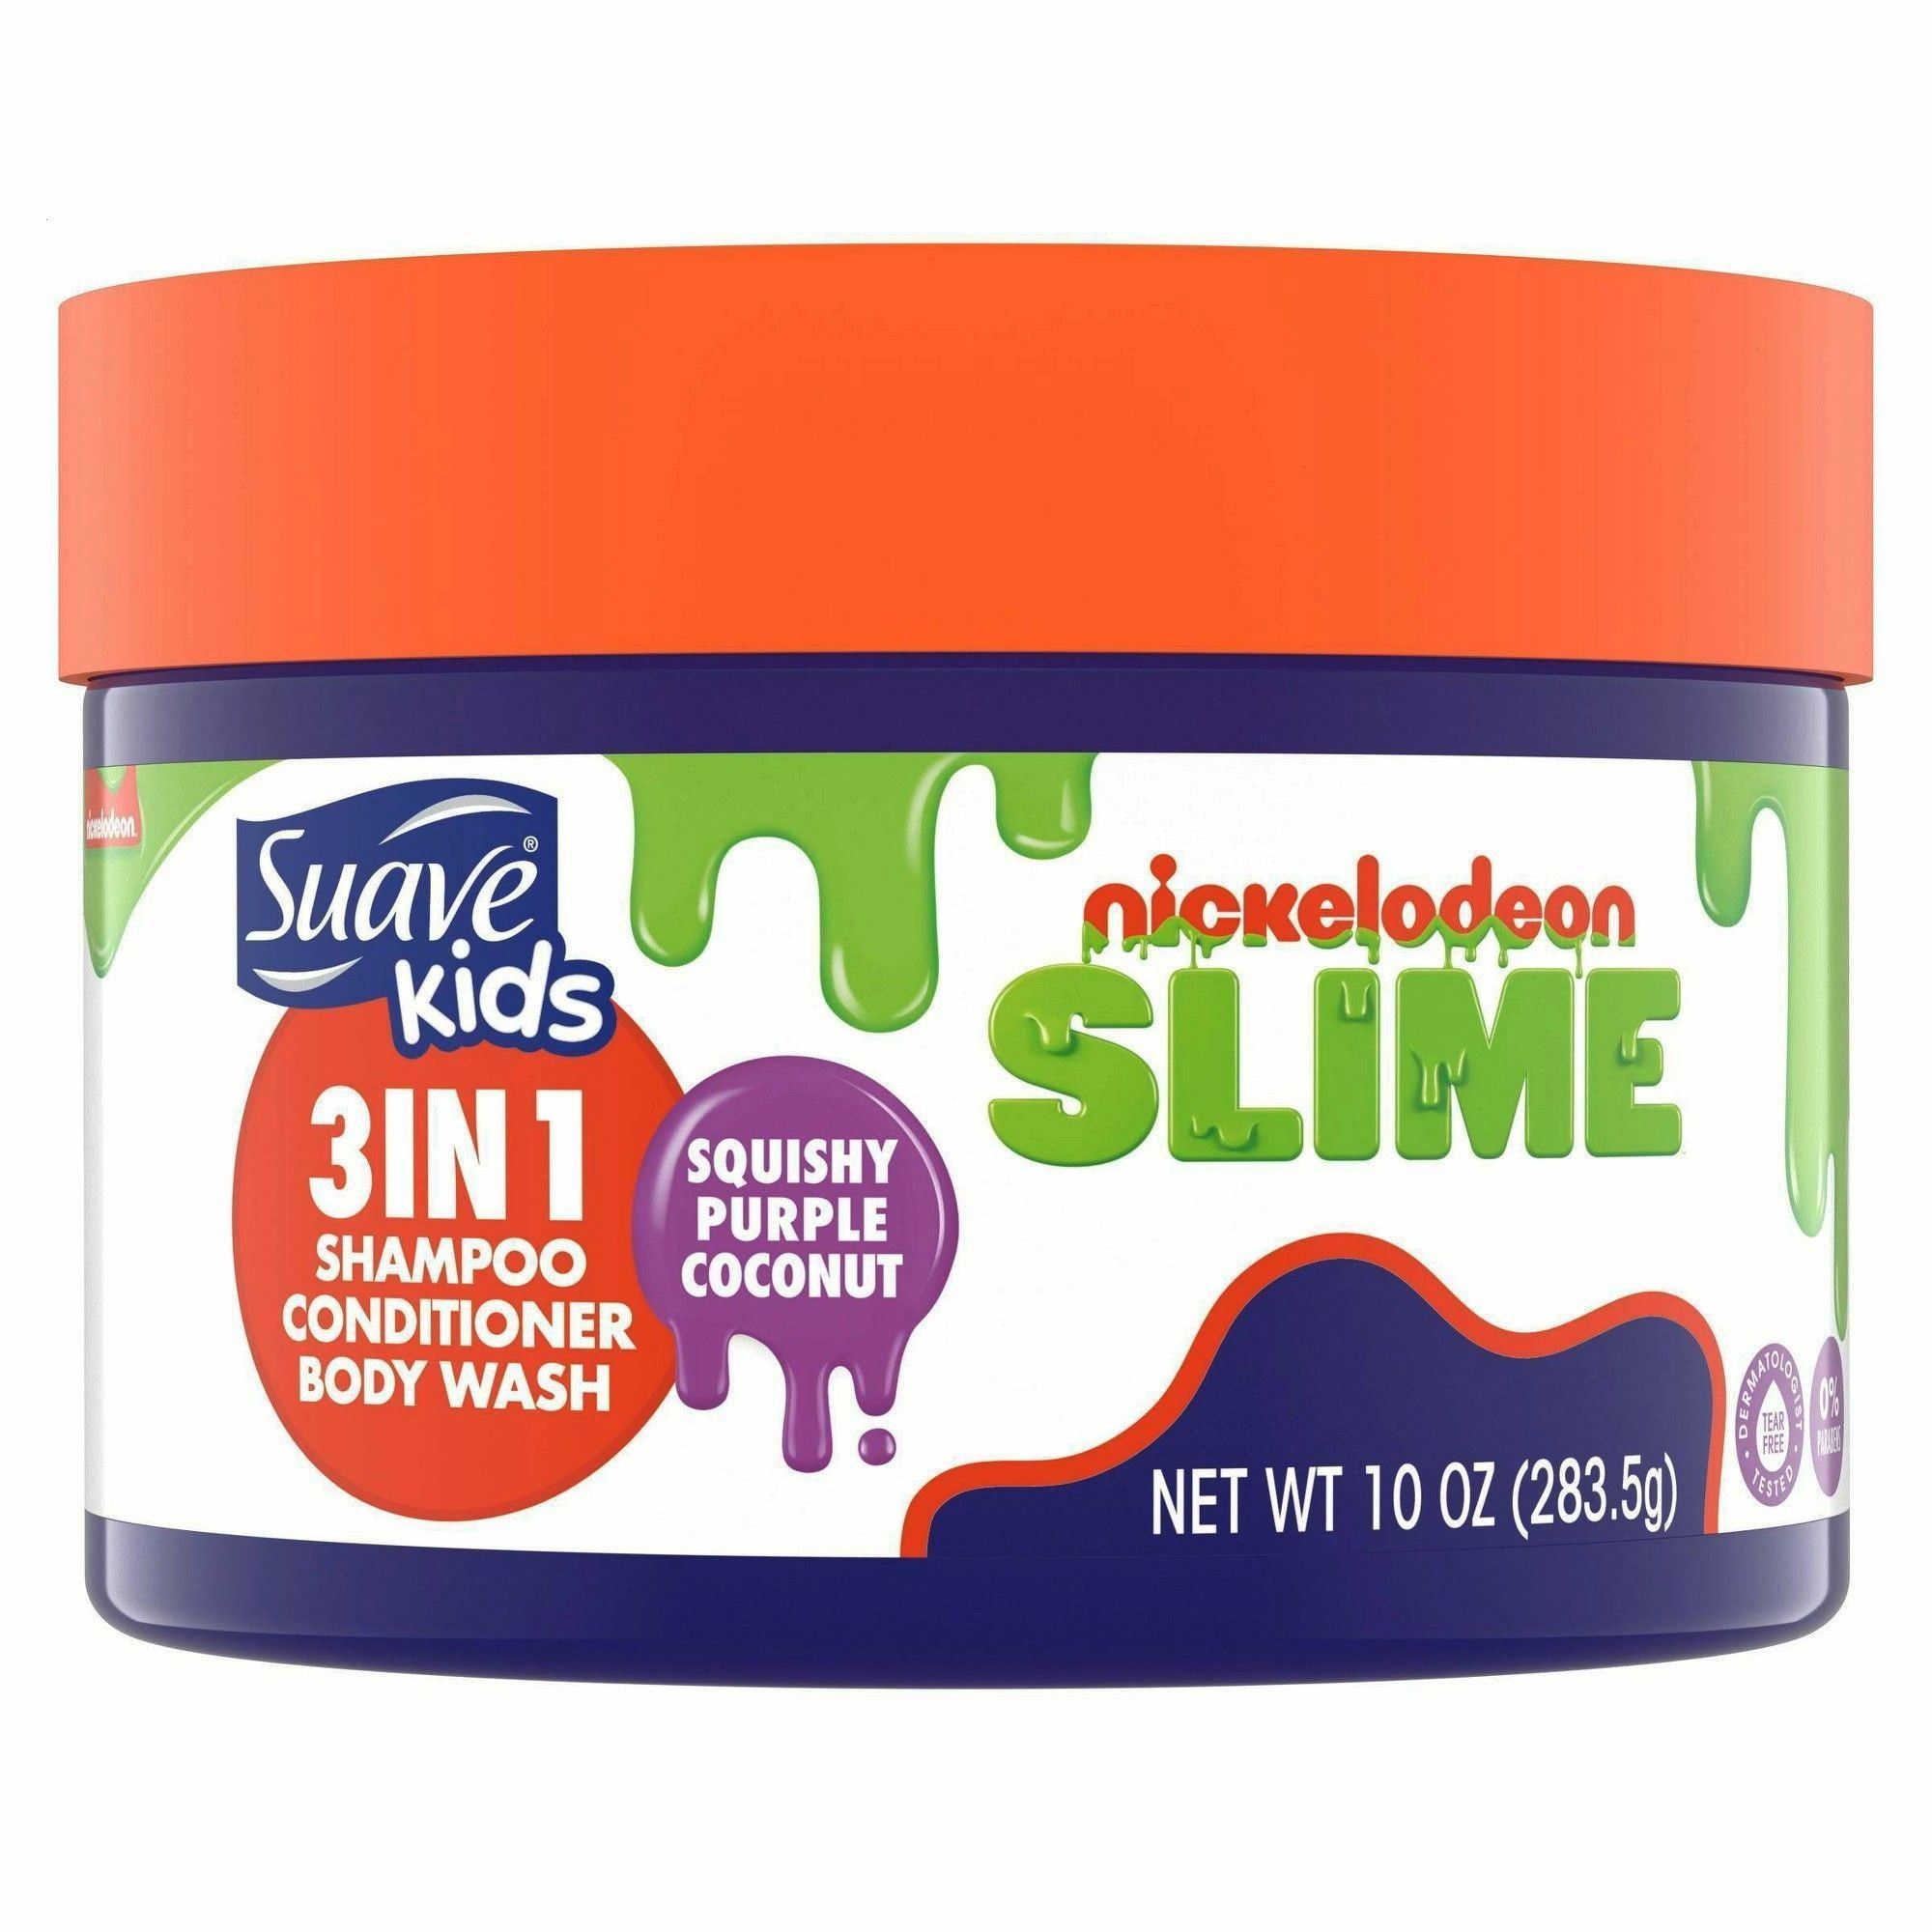 Kids Purple Slime 3in1 Shampoo  Conditioner  Body Wash  10oz10ozSuave Kids Purple Slime 3in1 Shampoo  Conditioner  Body Wash  10oz10oz Phantomeffekt von Bobbys auf Beat r...